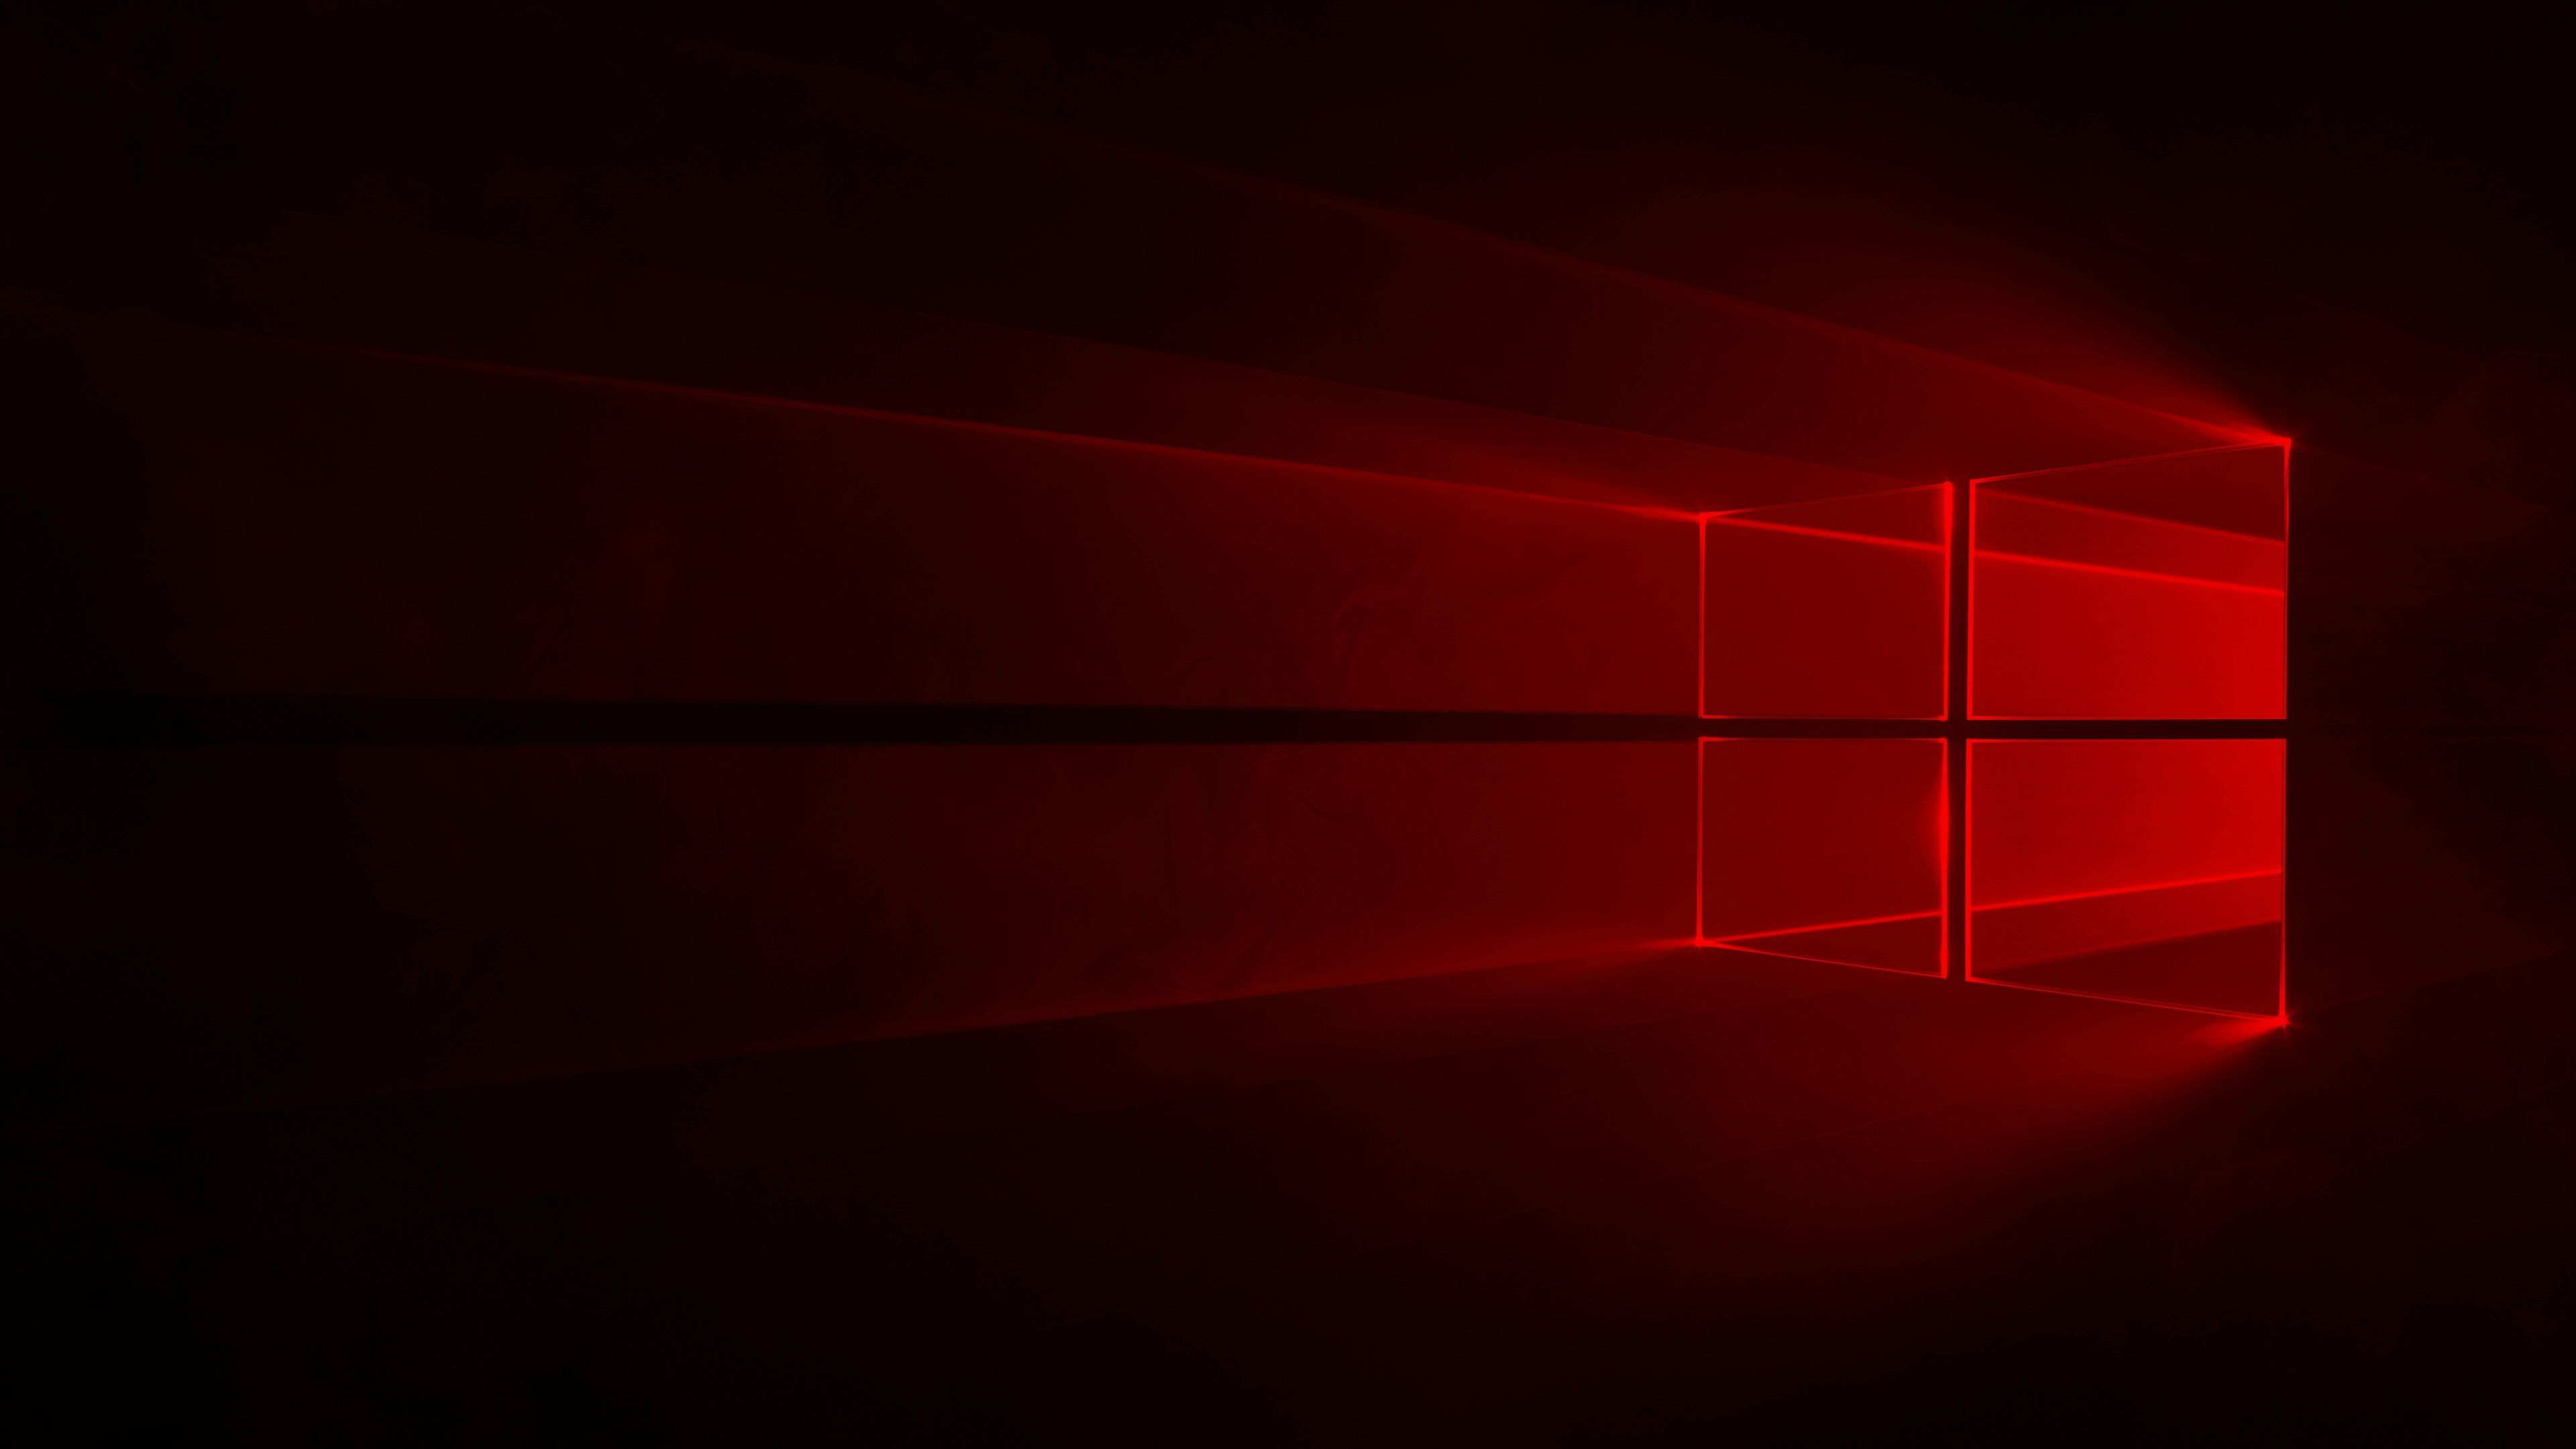 Top 10 Microsoft Resellers In Singapore In 2020 Wallpaper Windows 10 Desktop Wallpaper Summer Red Windows